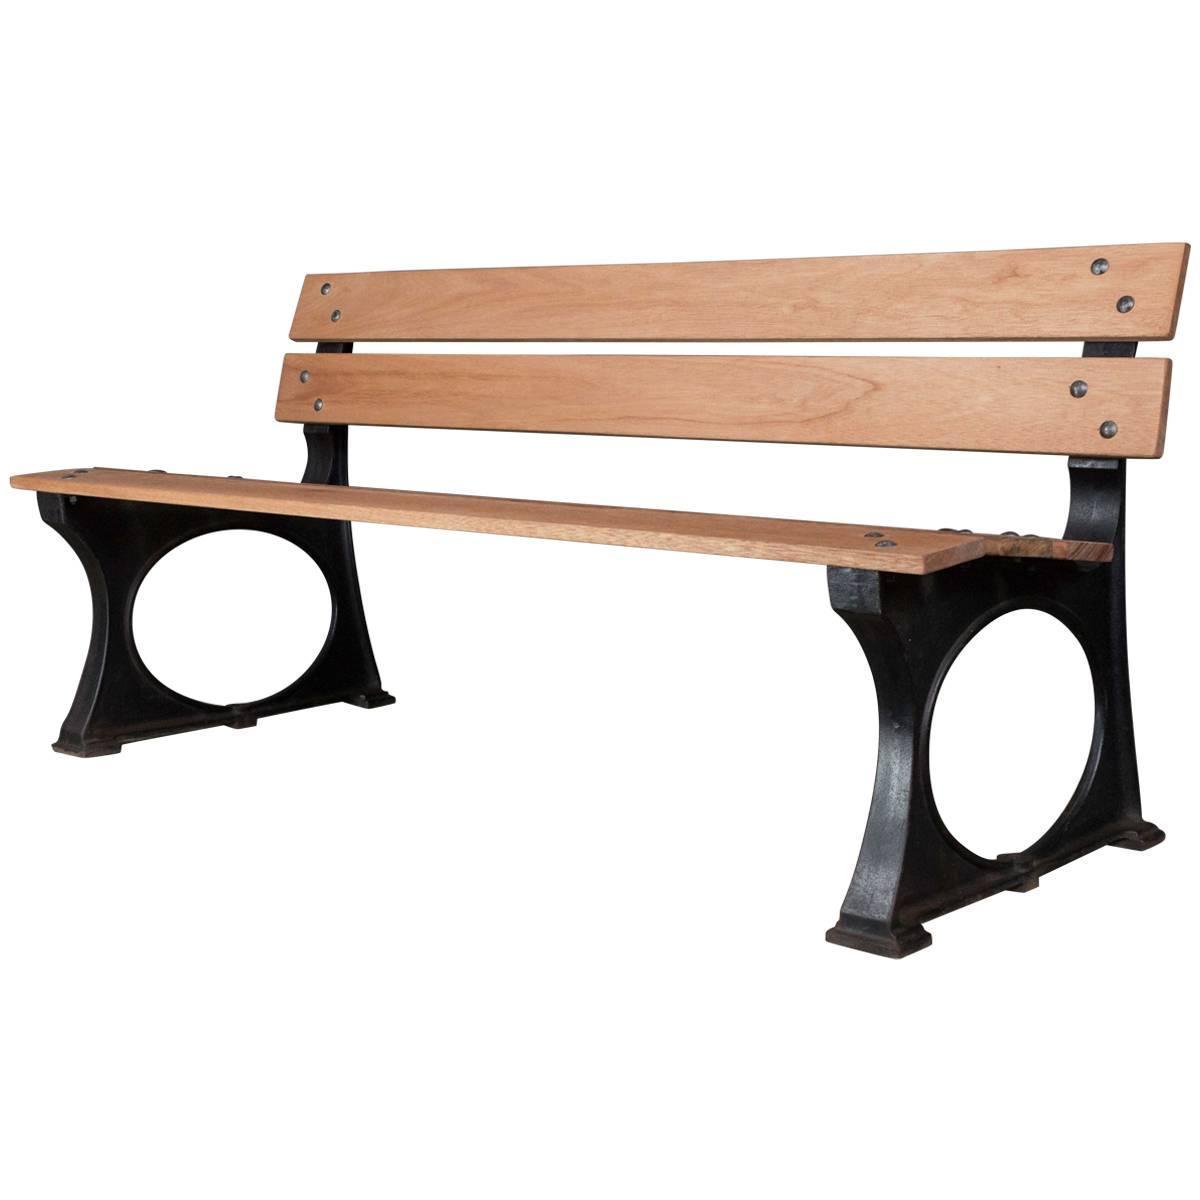 deco garden furniture. Deco Garden Furniture. 1920s French Iron And Mahogany Park Bench Furniture O